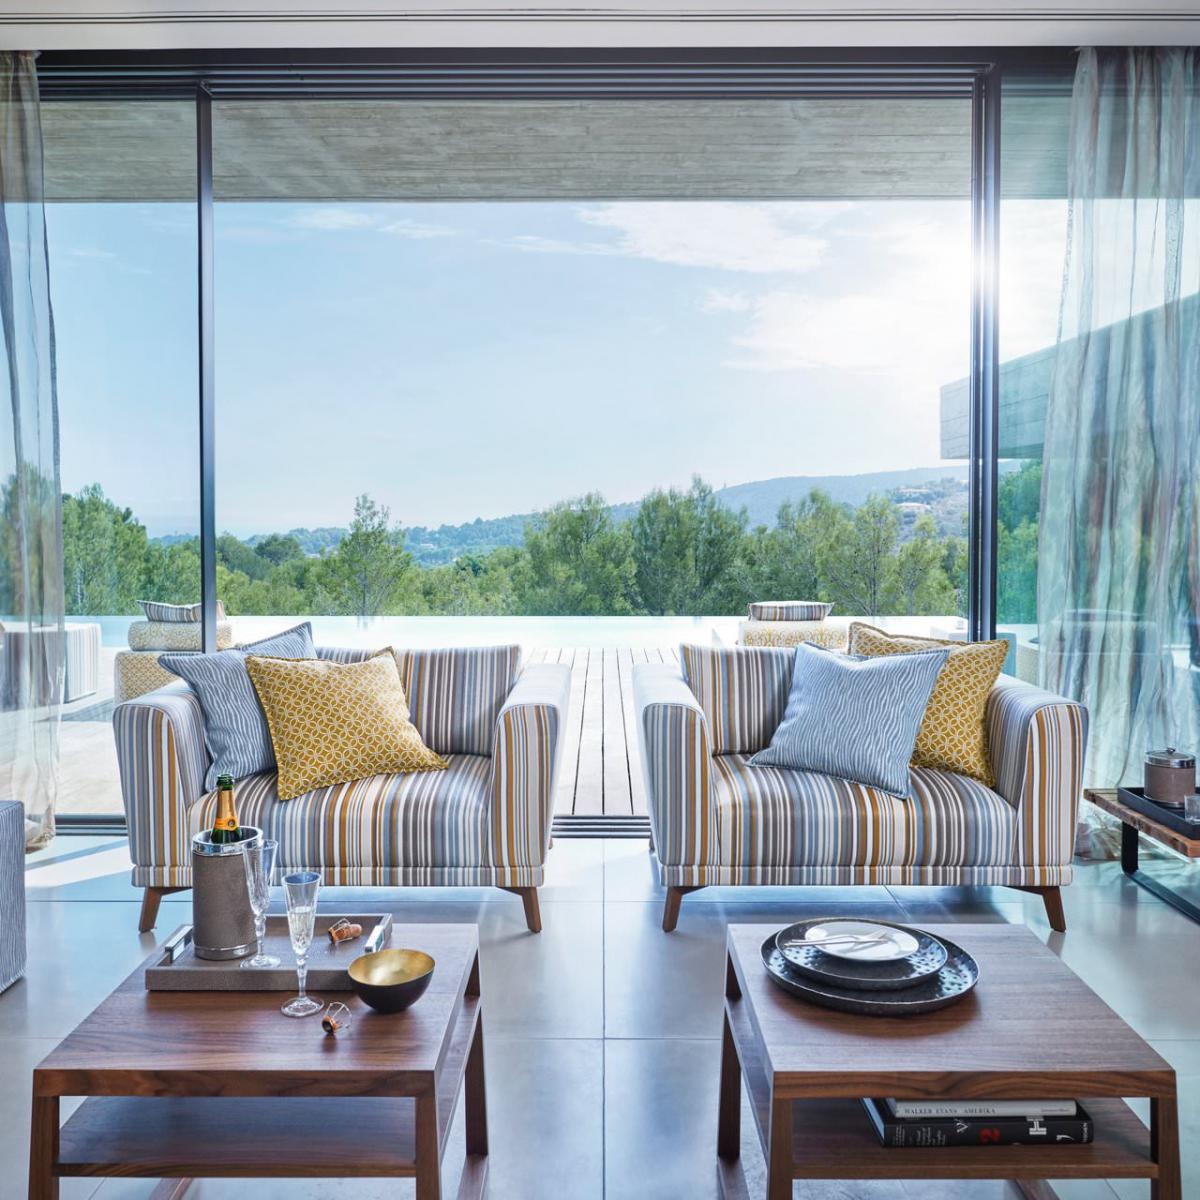 luxus raumausstattung shop sammlung. Black Bedroom Furniture Sets. Home Design Ideas